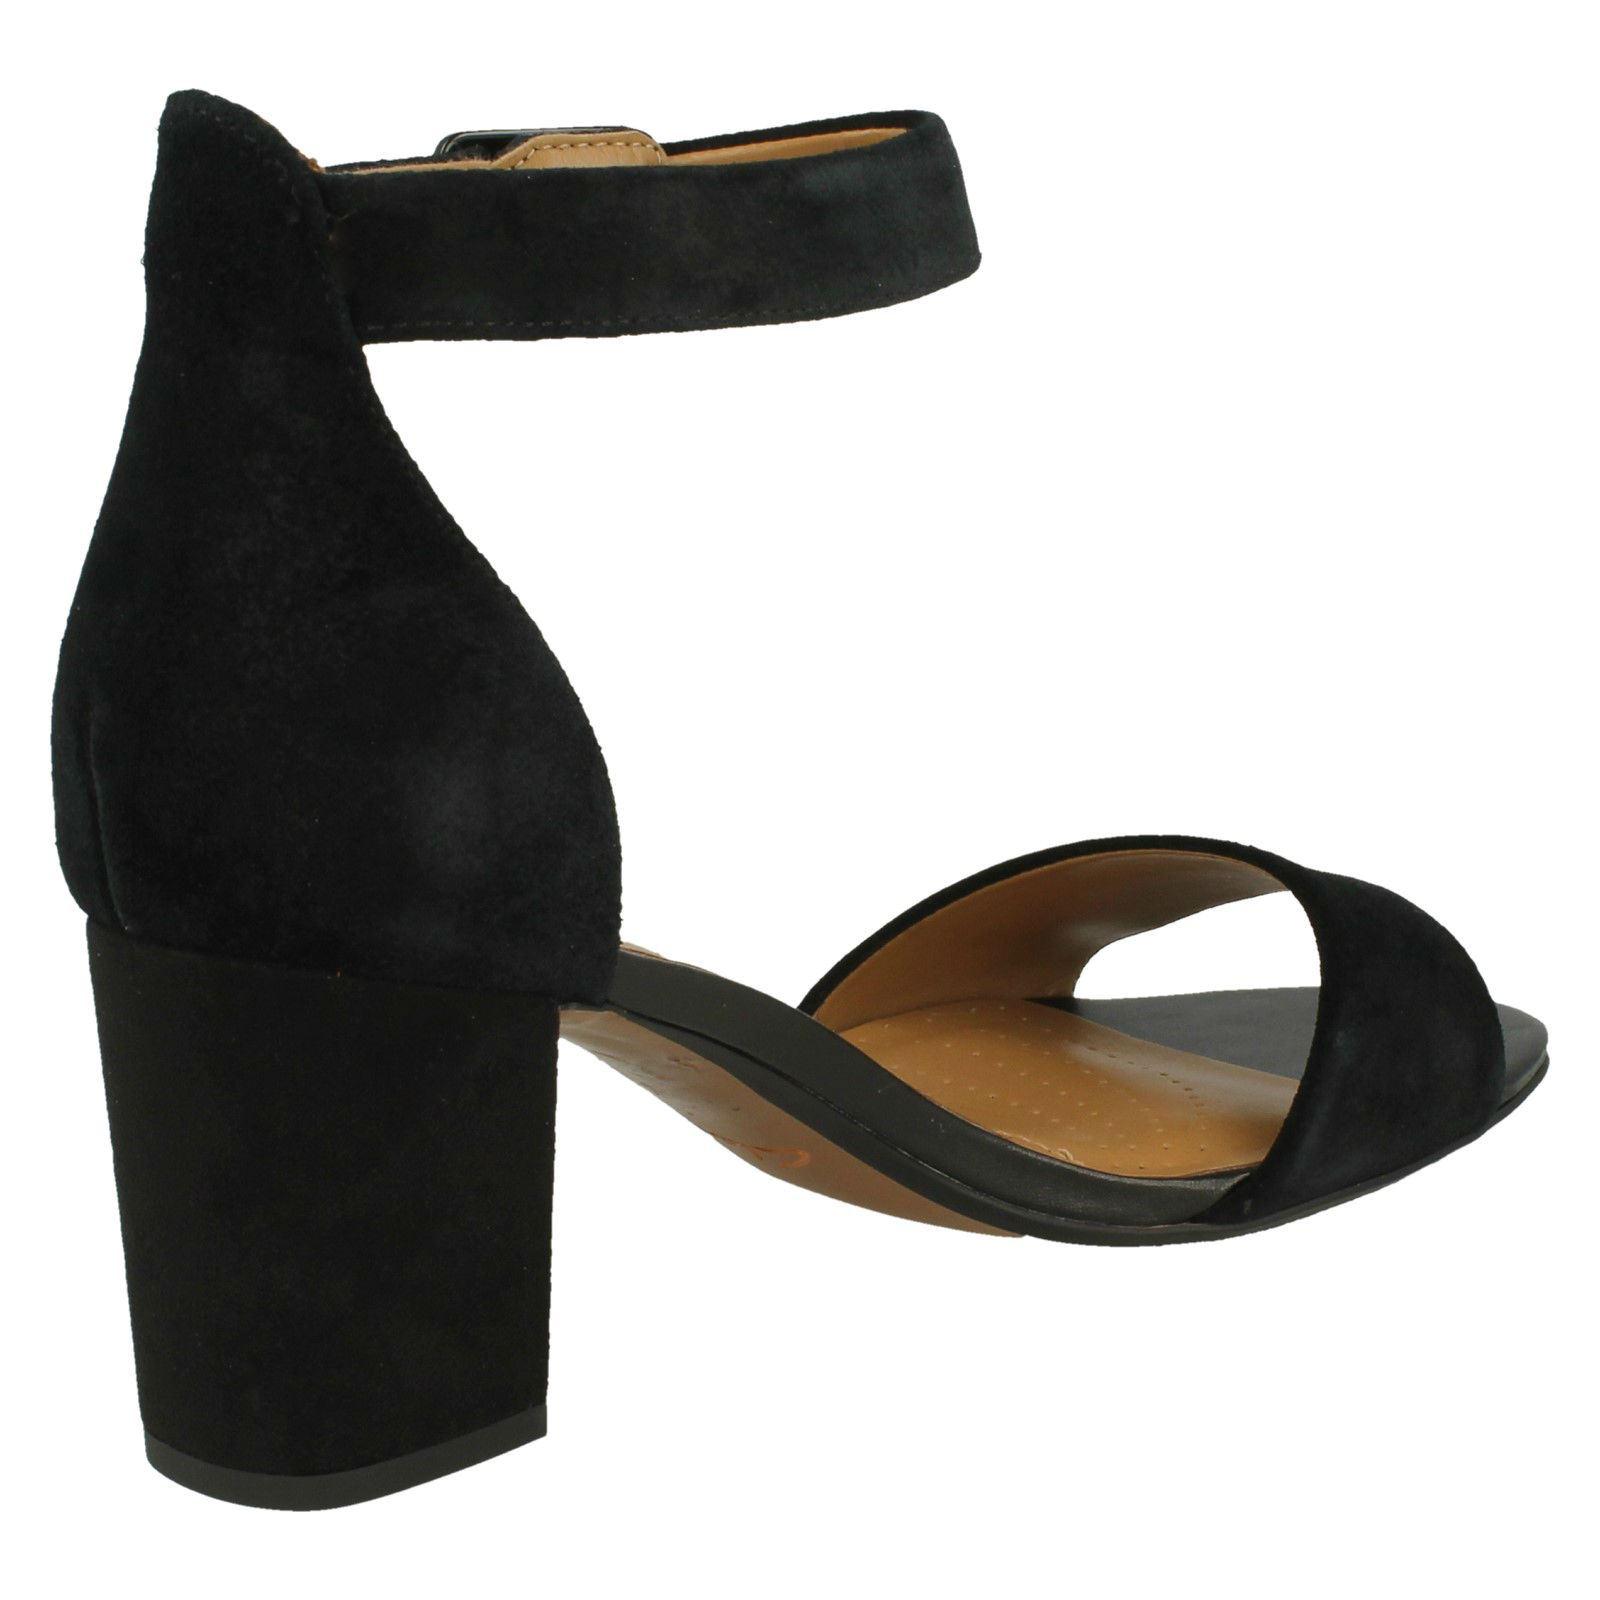 b6e3423e363 Ladies-Clarks-Heeled-Sandals-Deva-Mae thumbnail 6